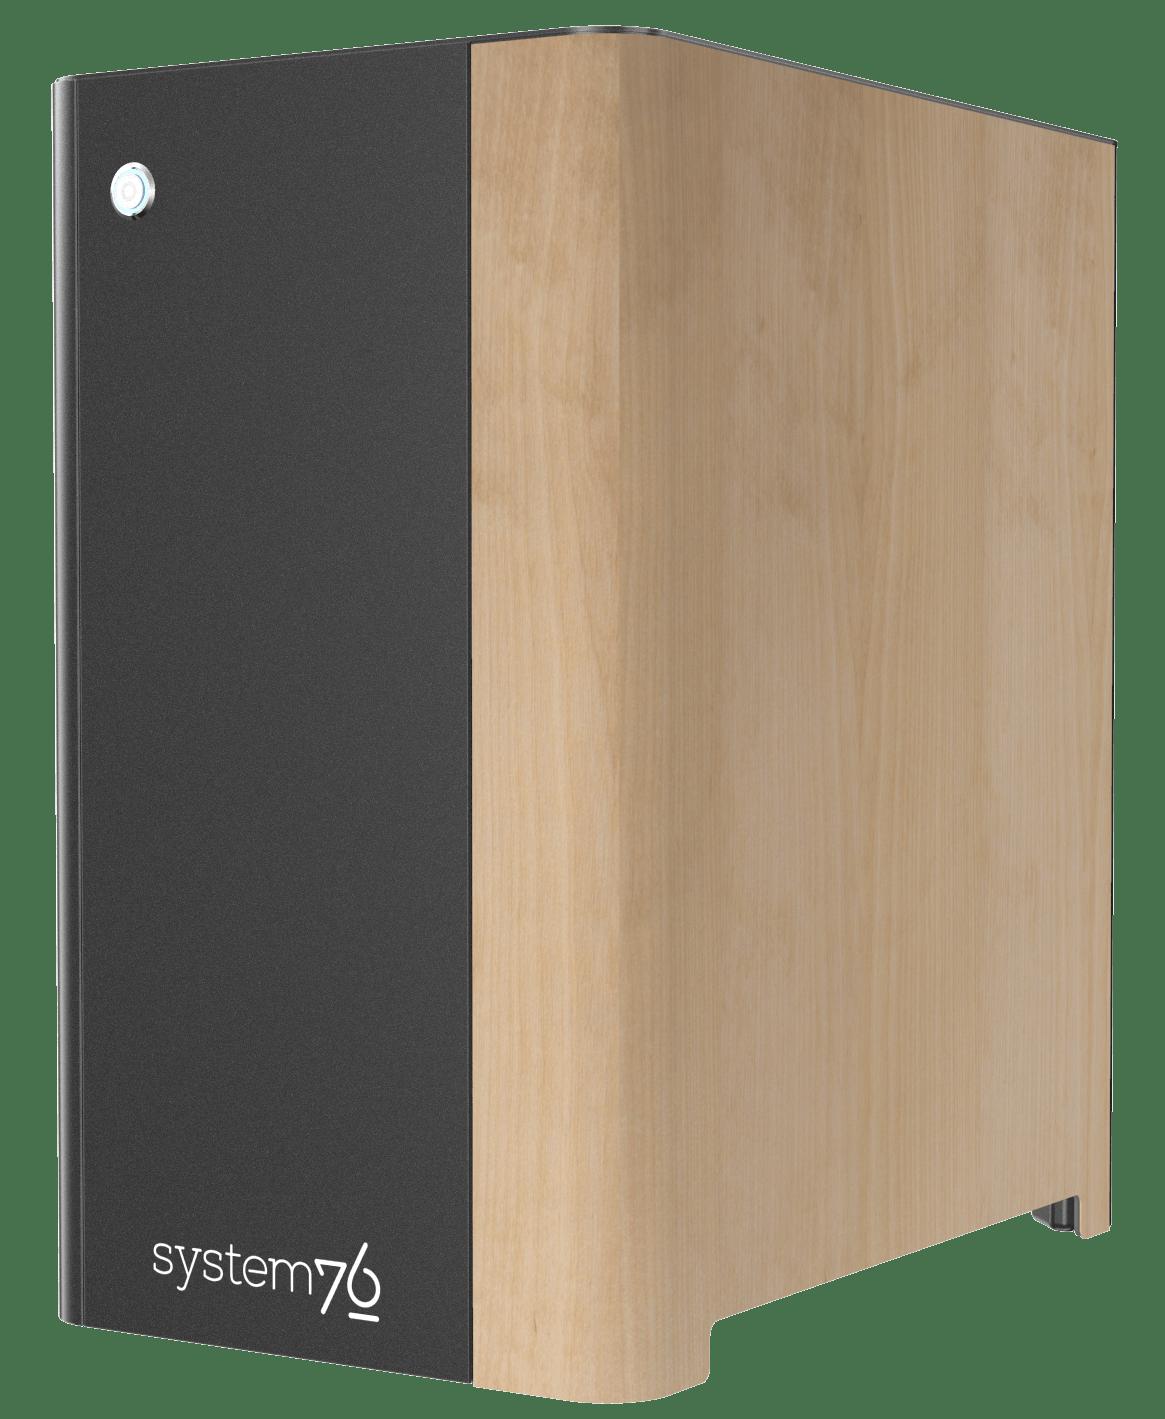 Side view of Thelio Major's birch wood veneer.